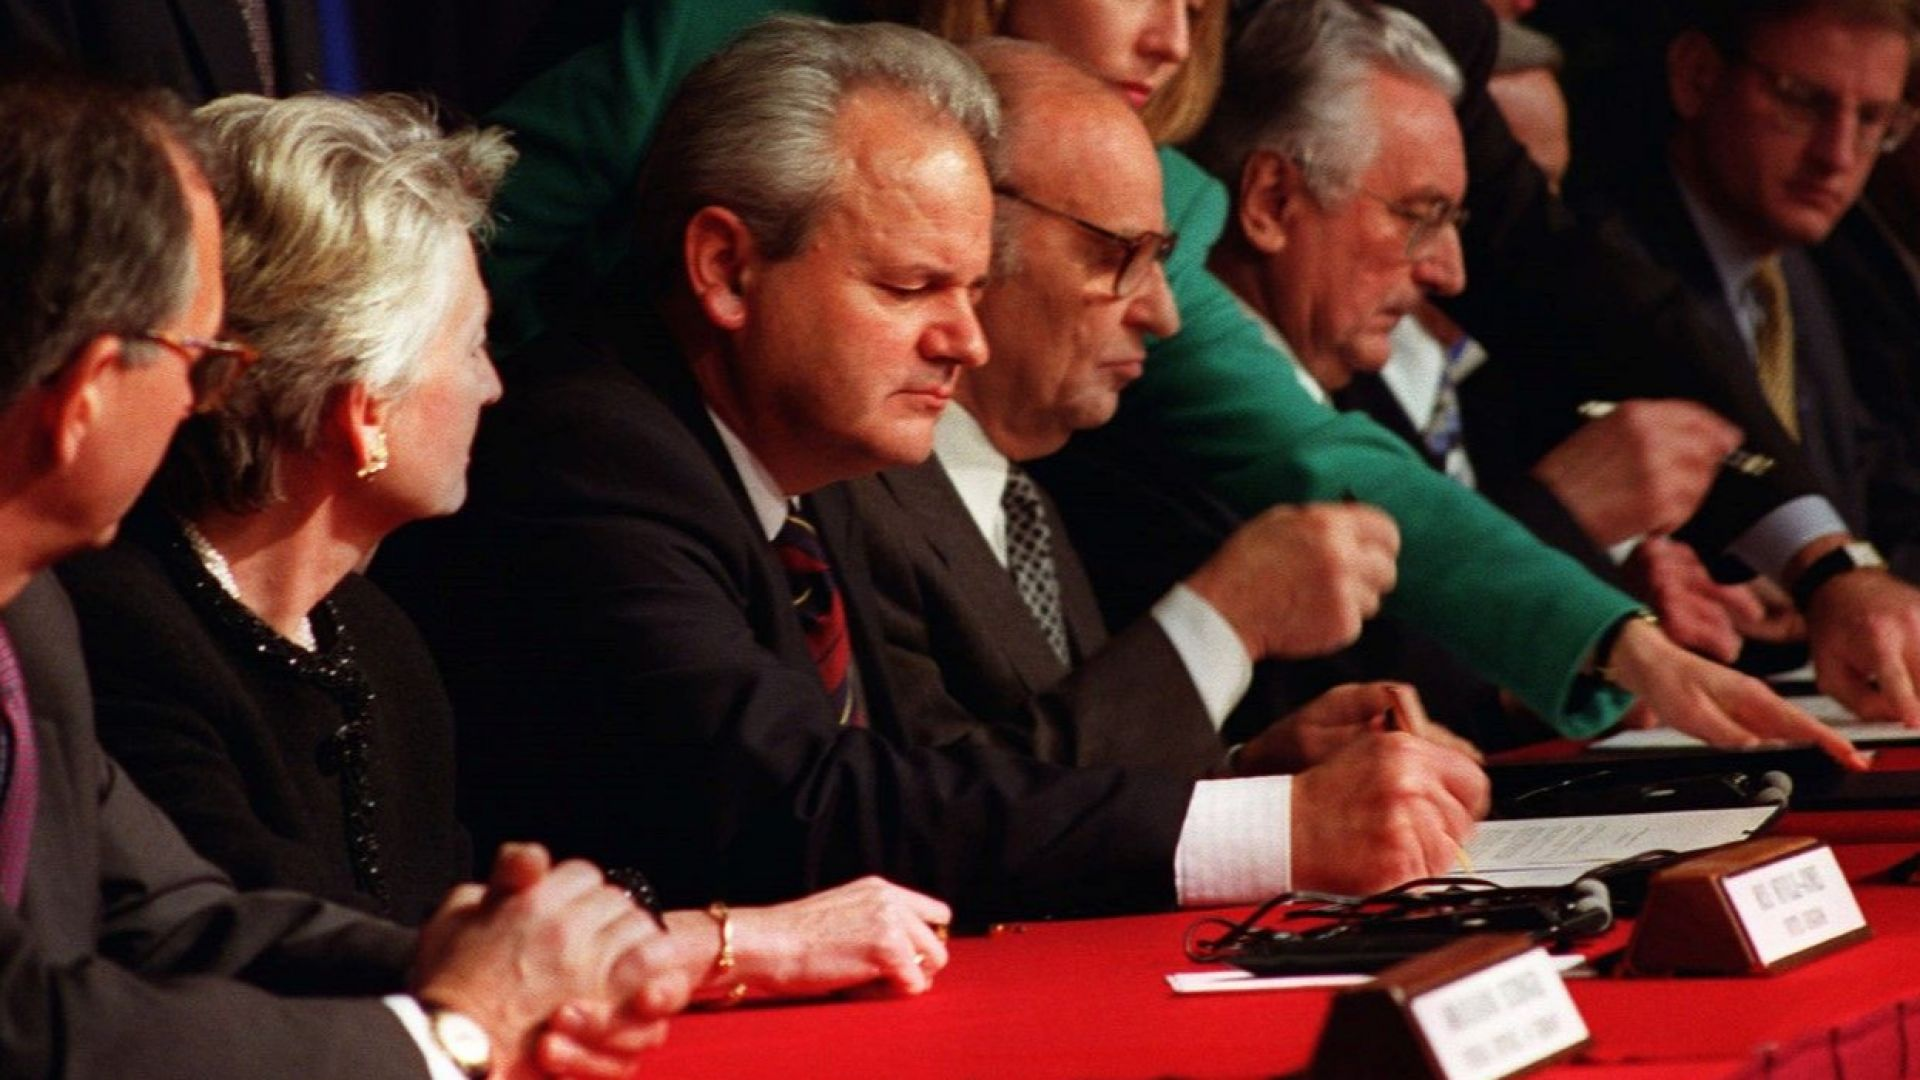 1 година затвор задочно за вдовицата на Милошевич